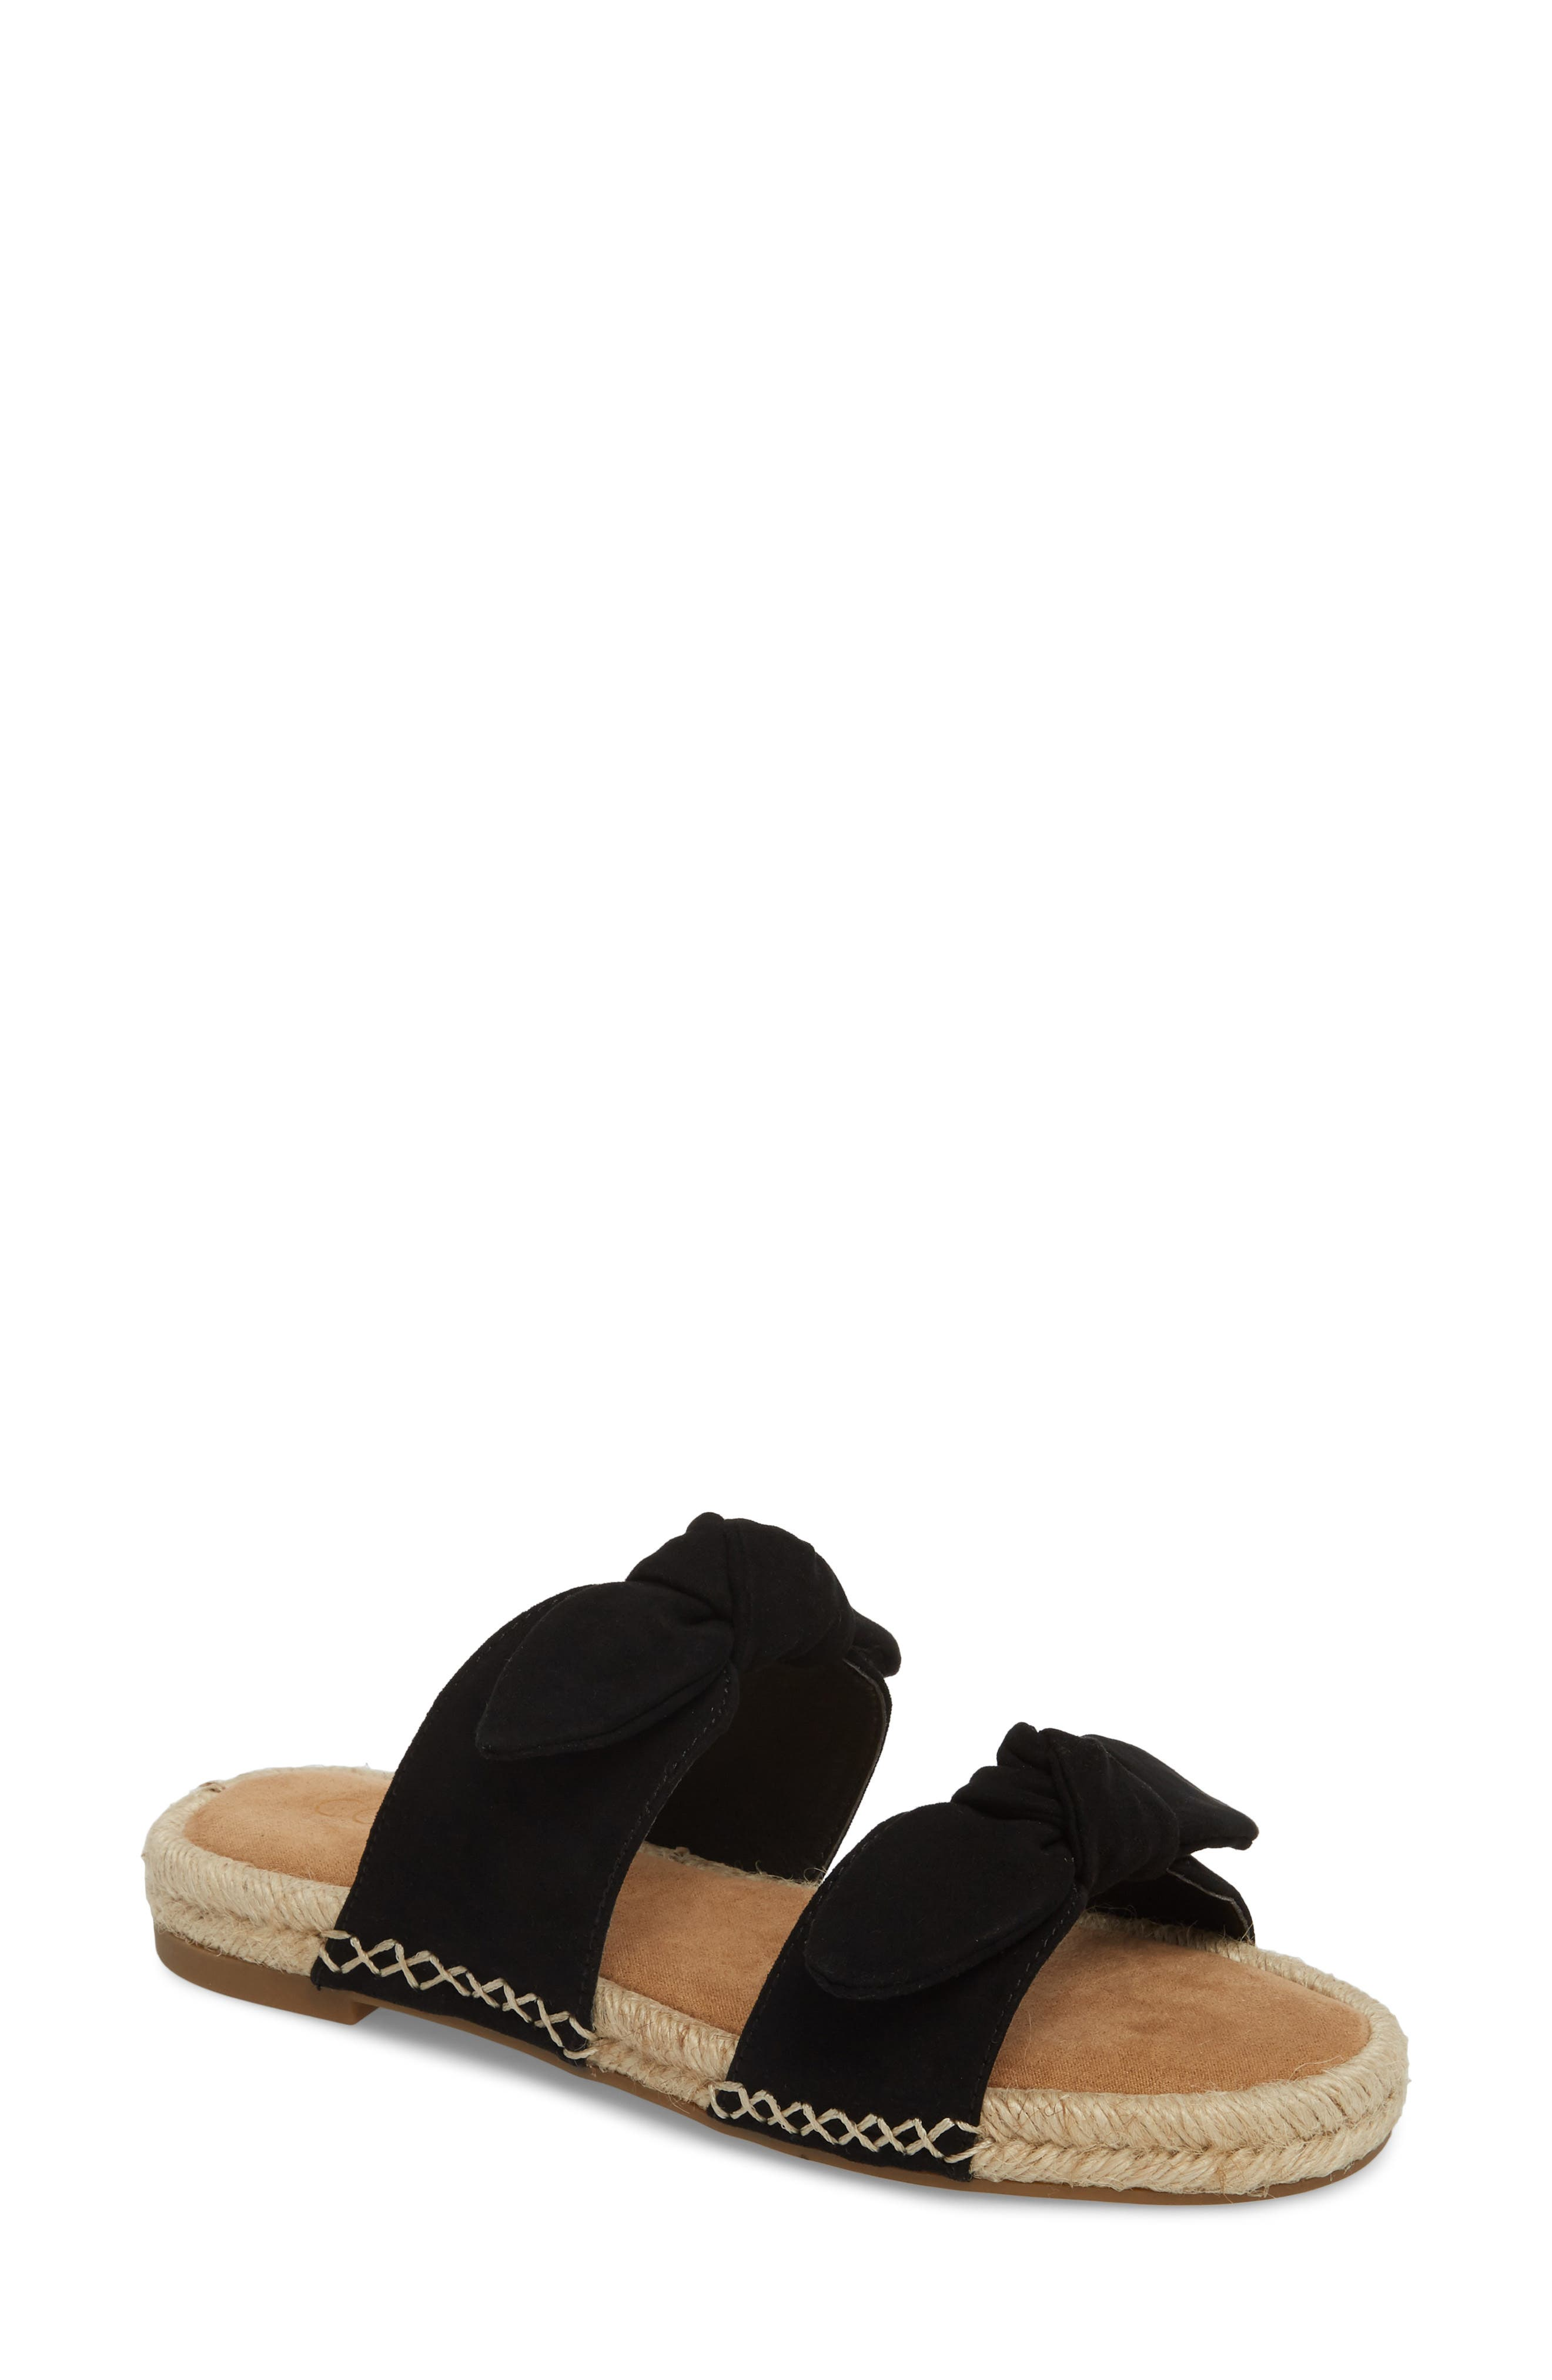 Gianna Espadrille Slide Sandal,                         Main,                         color, 001